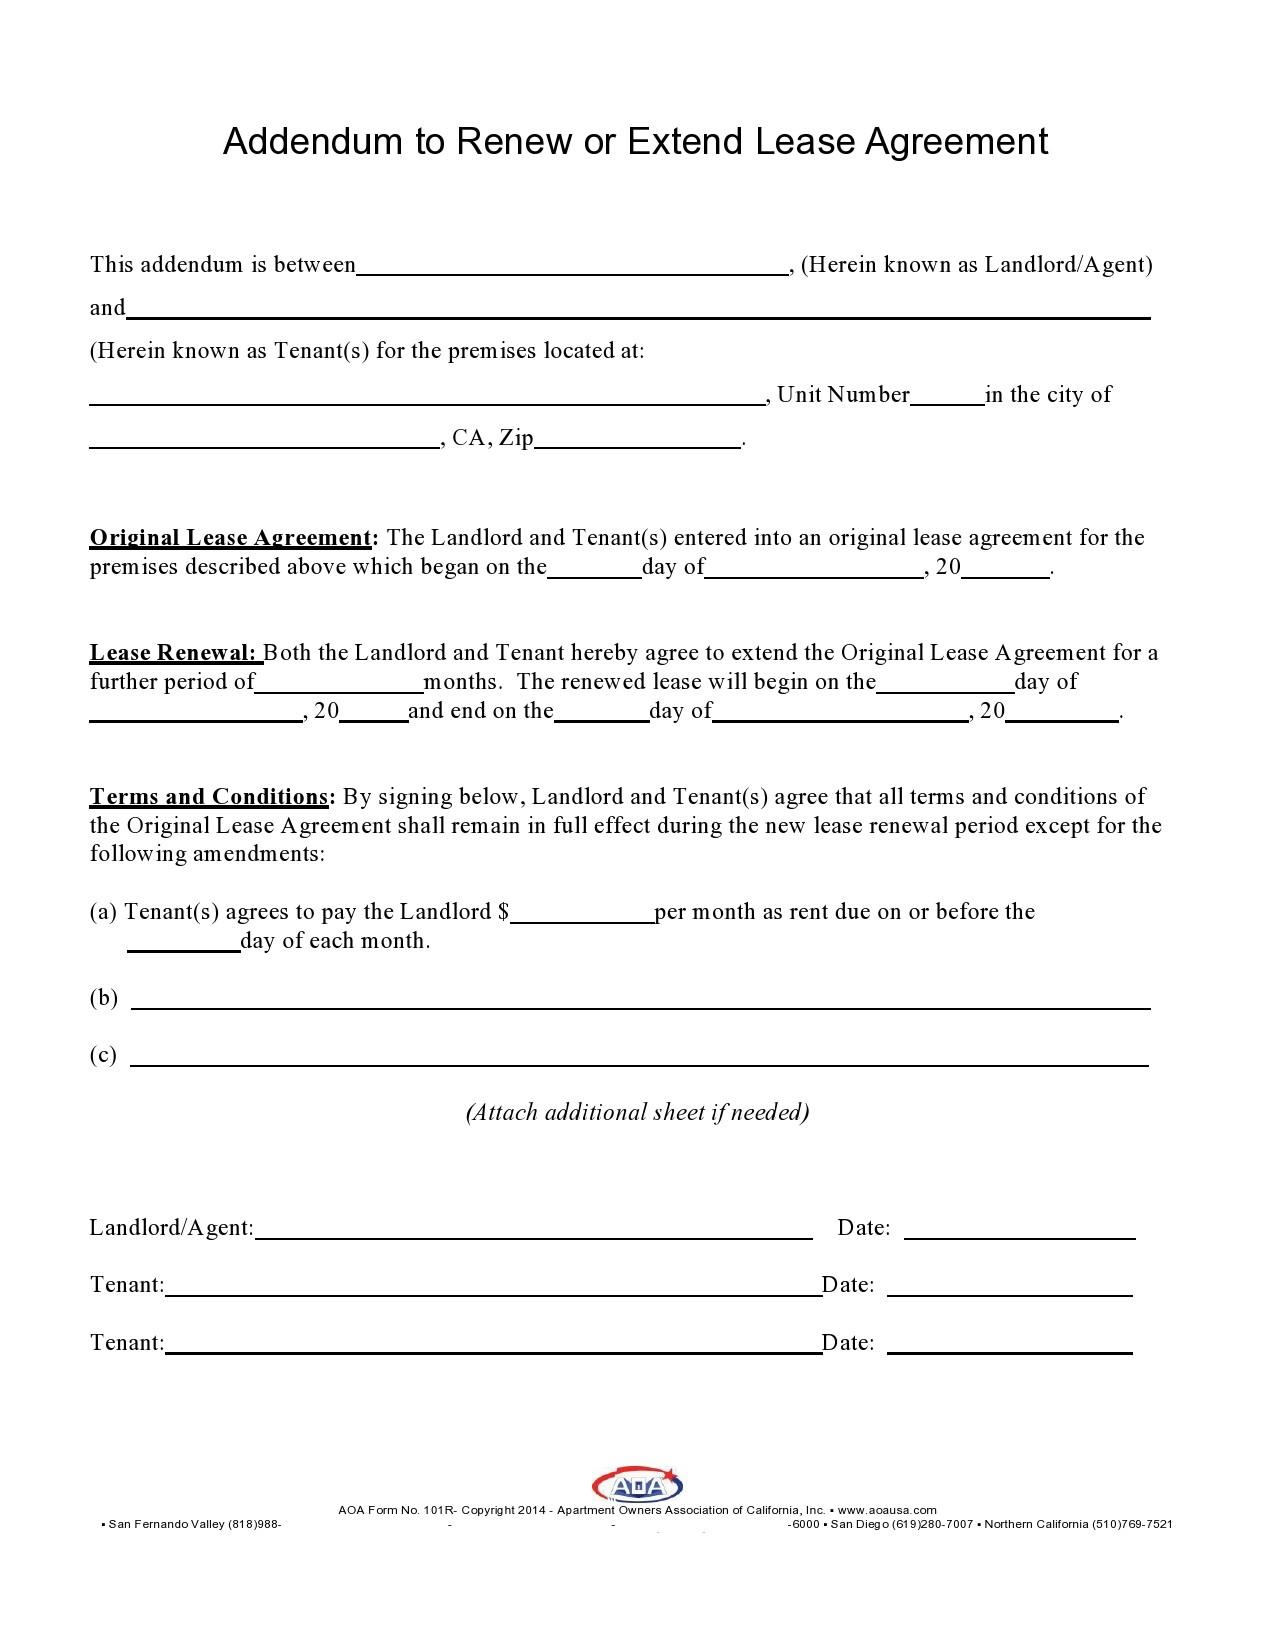 Free lease extension addendum 06